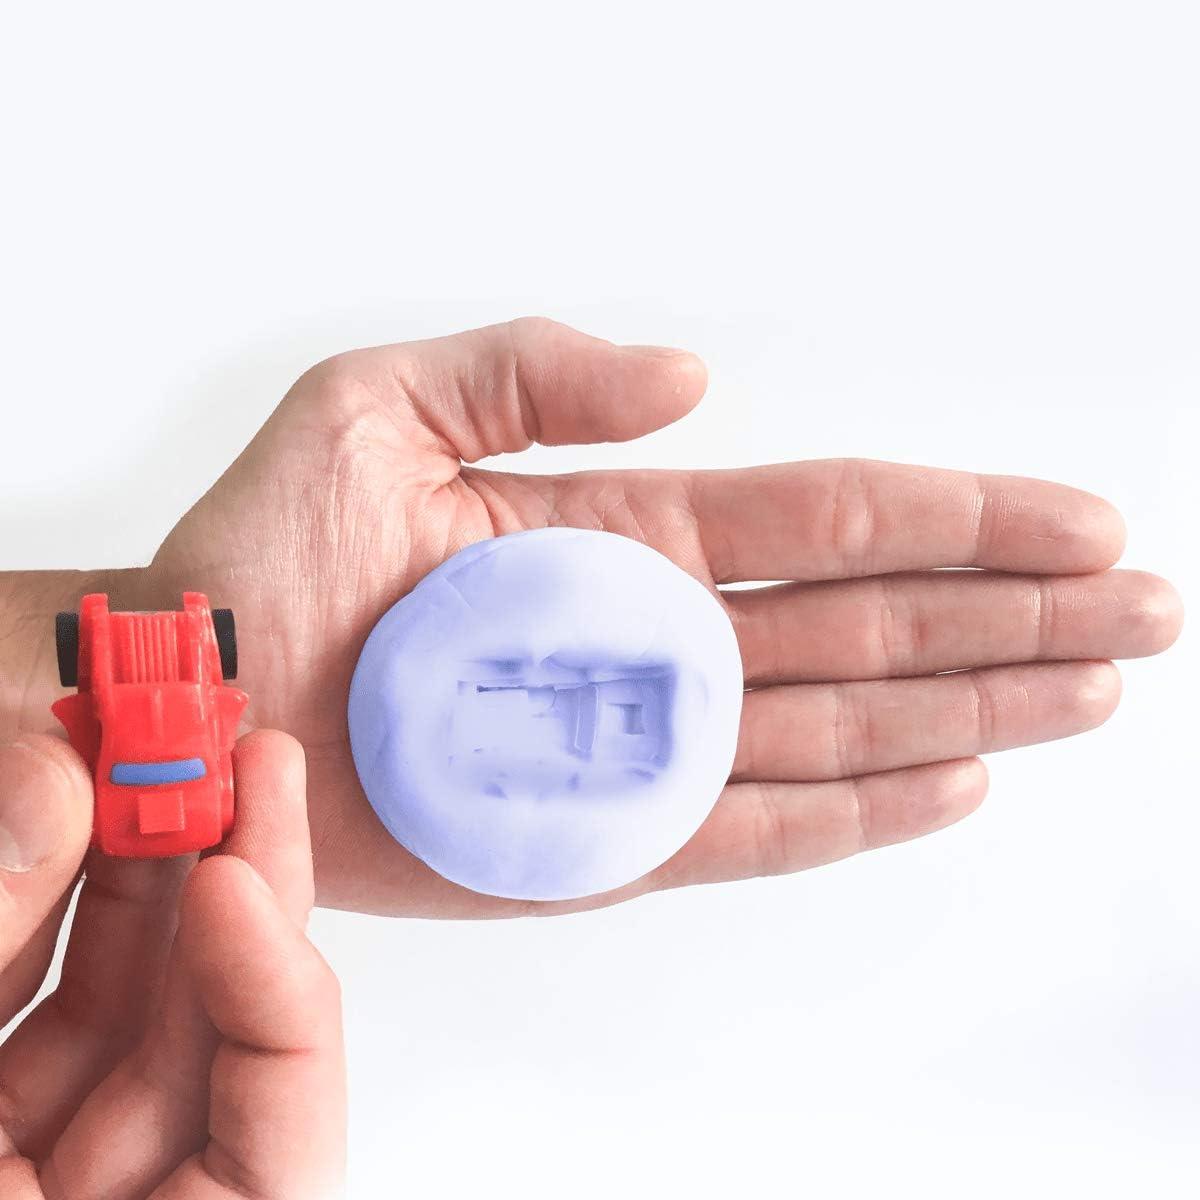 Sil Hand Goma de silicona para moldes (1 kg): Amazon.es: Bricolaje ...